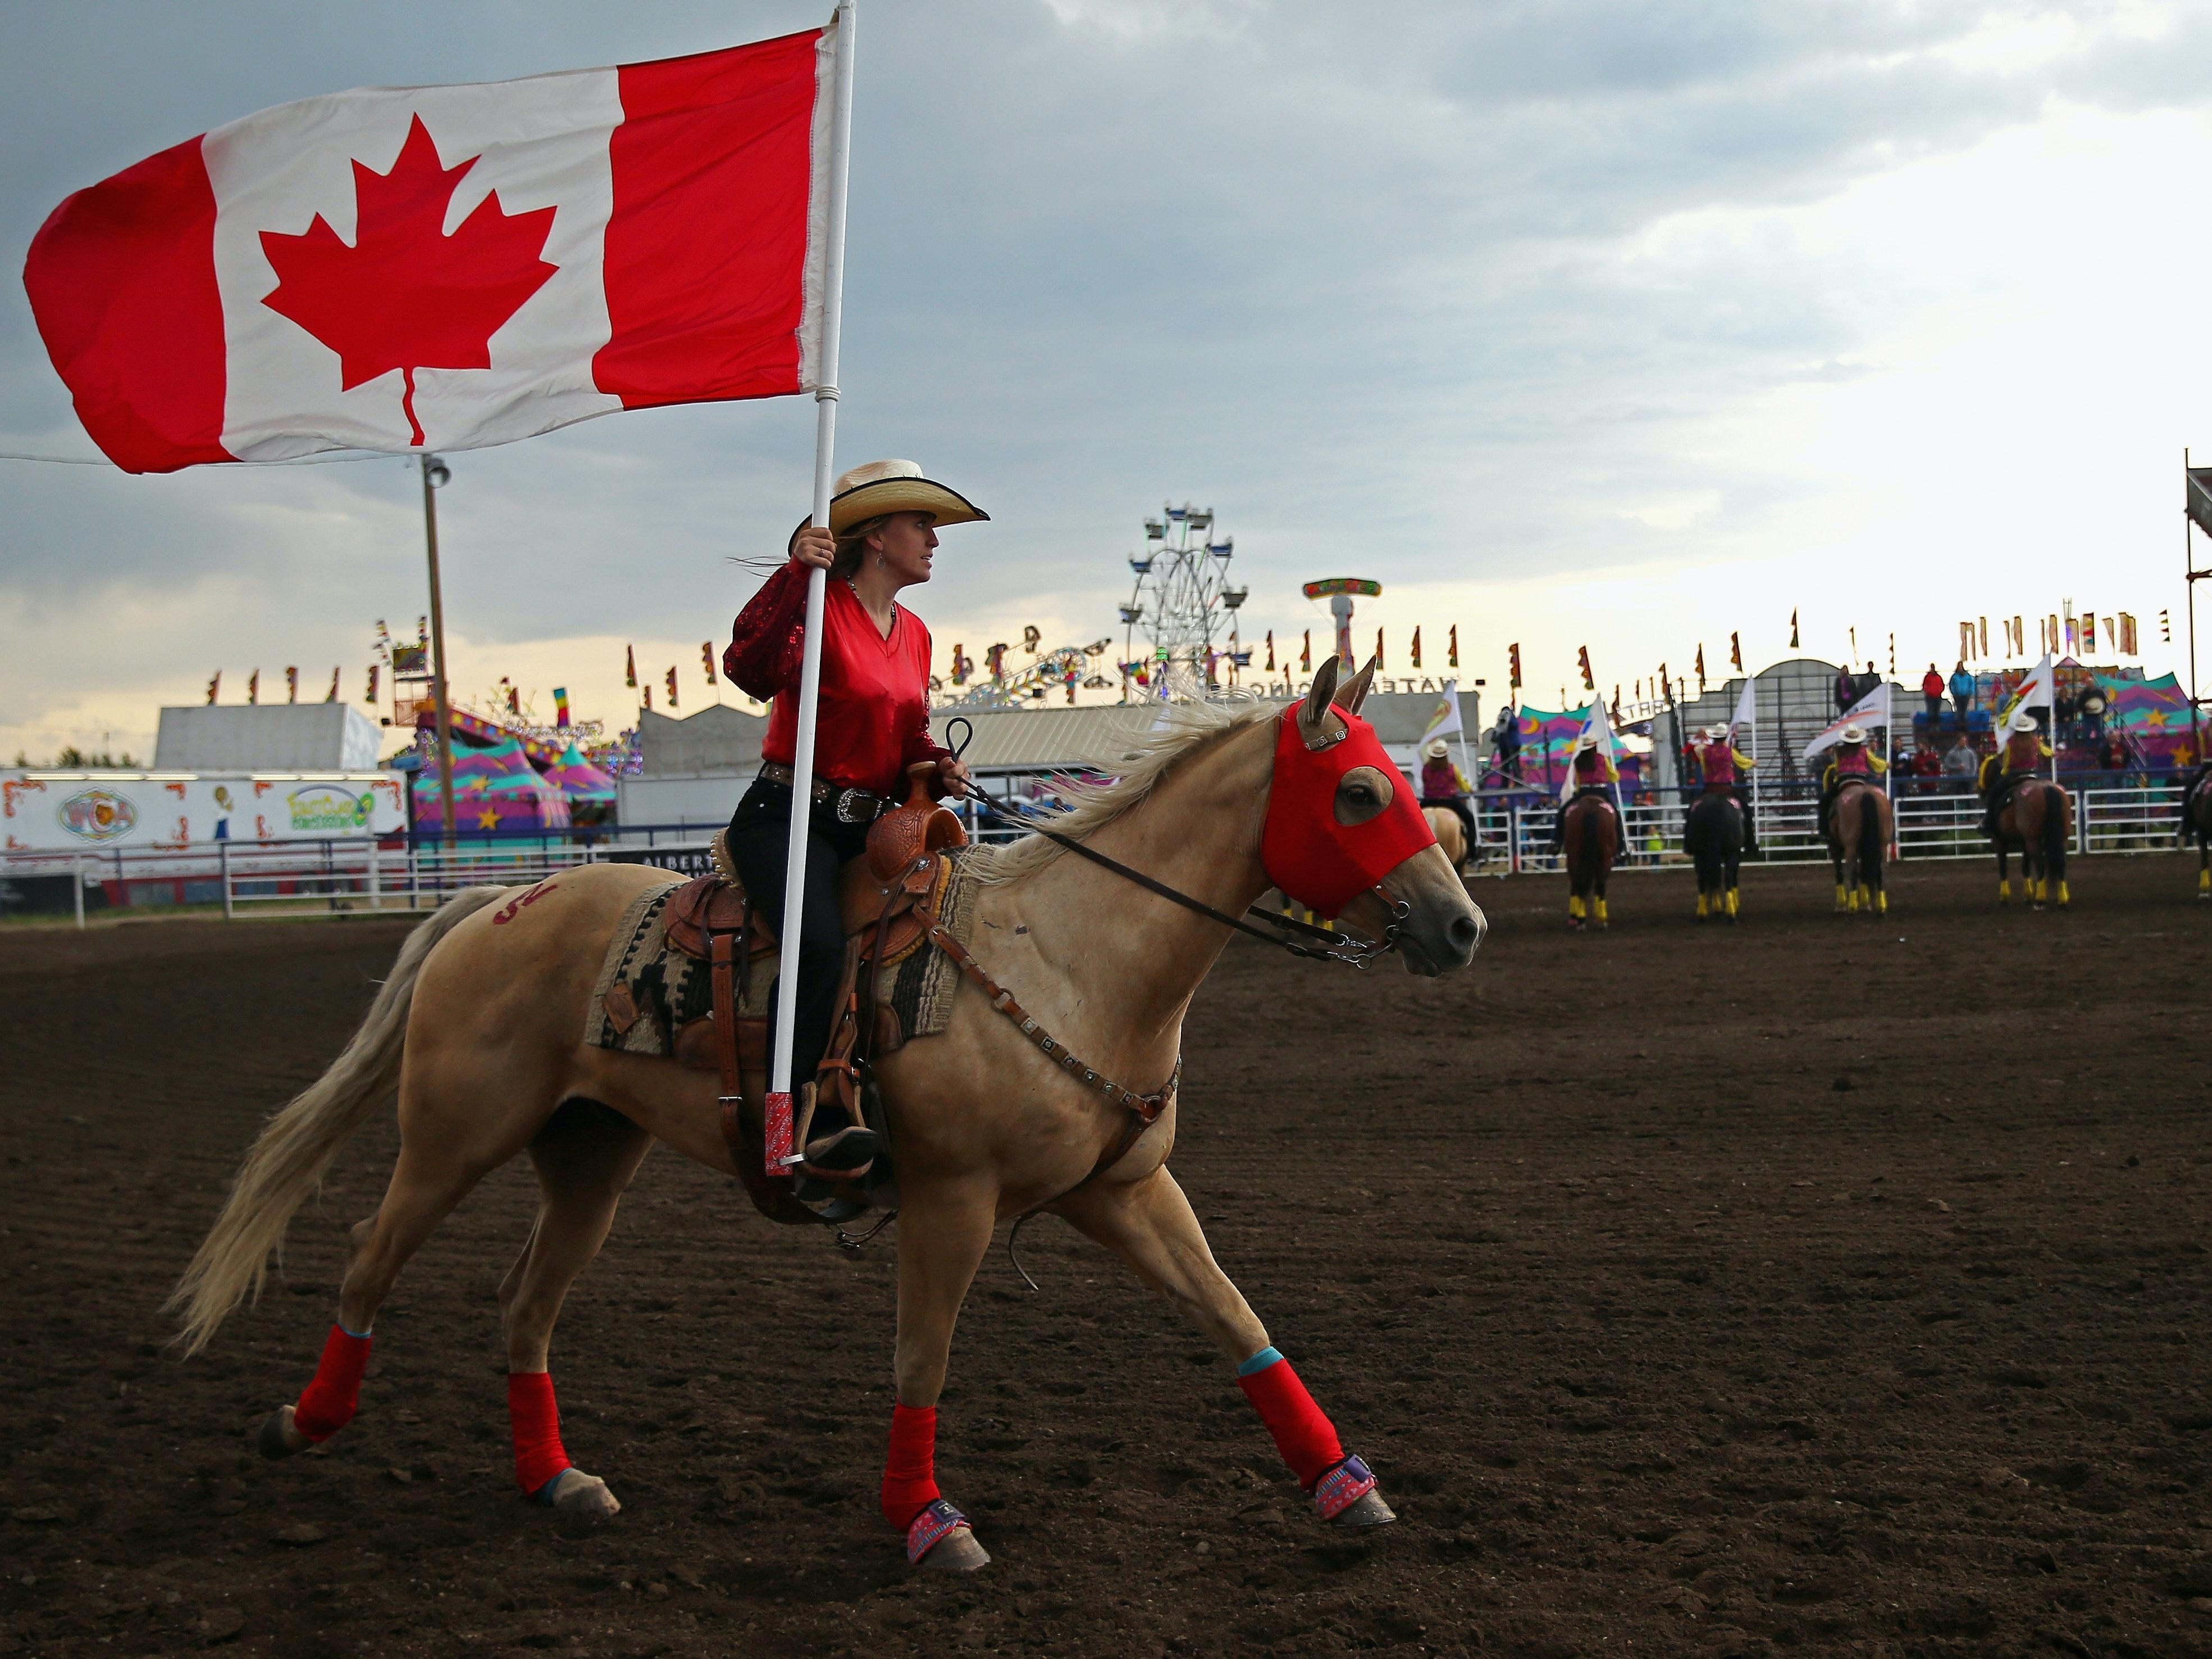 O Canada O Canada save us from Donald Trump